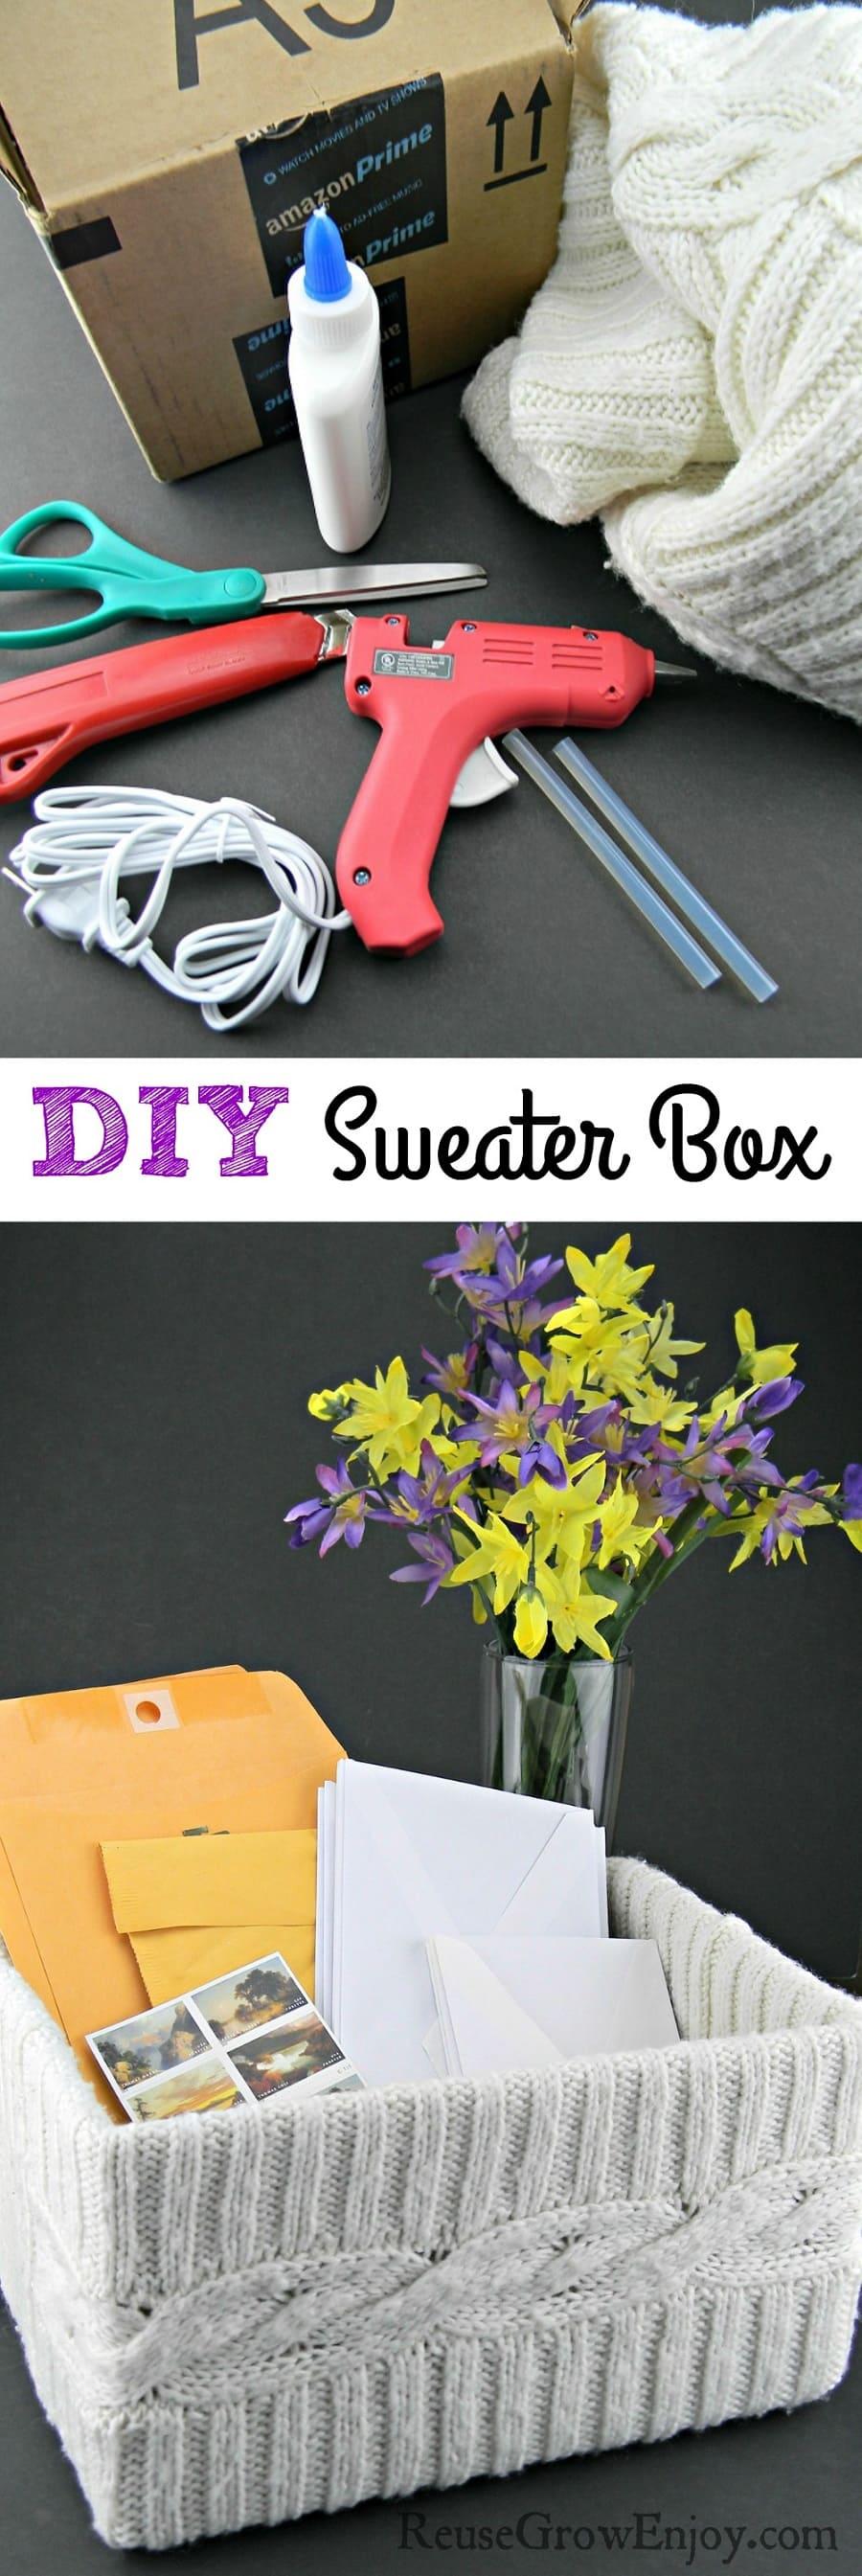 Sweater Box DIY